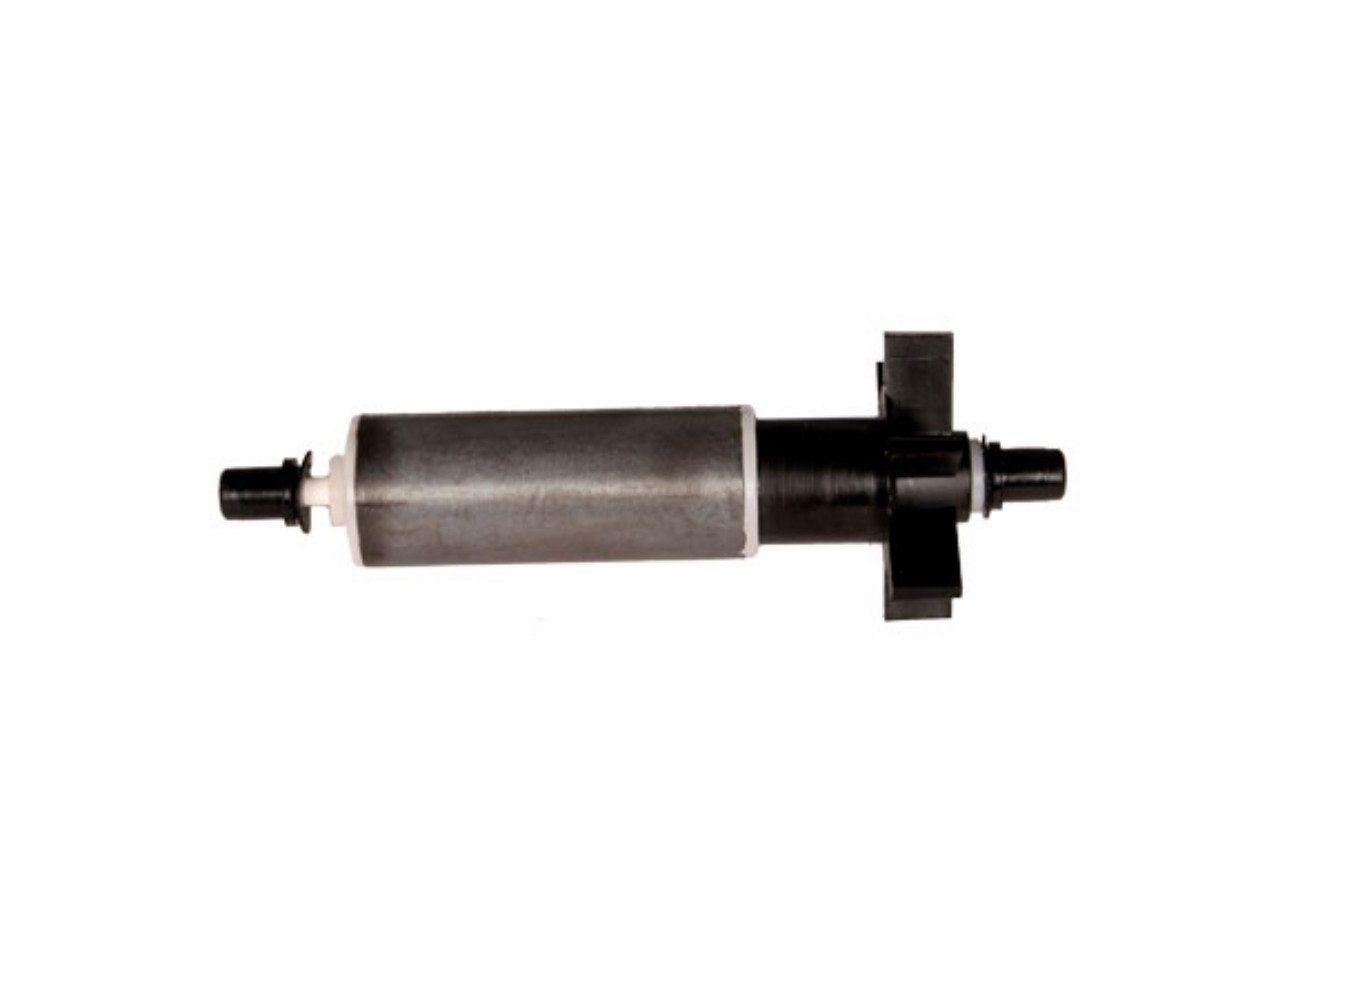 Aquajet Replacement Impeller Kit